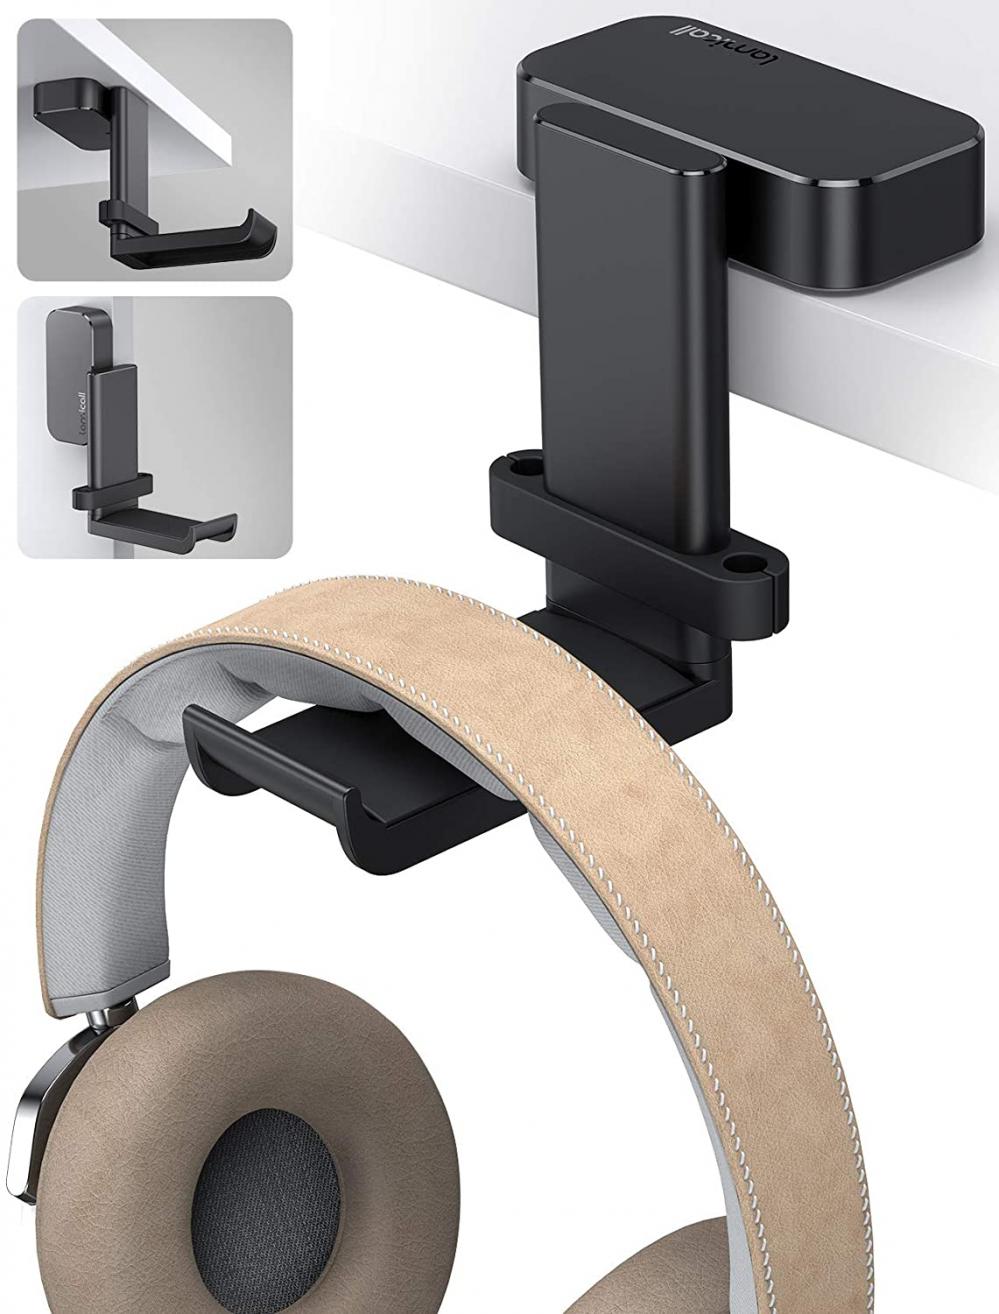 Lamicall Headphone Stand, Swivels Headset Hanger - Adjustable Desktop Black